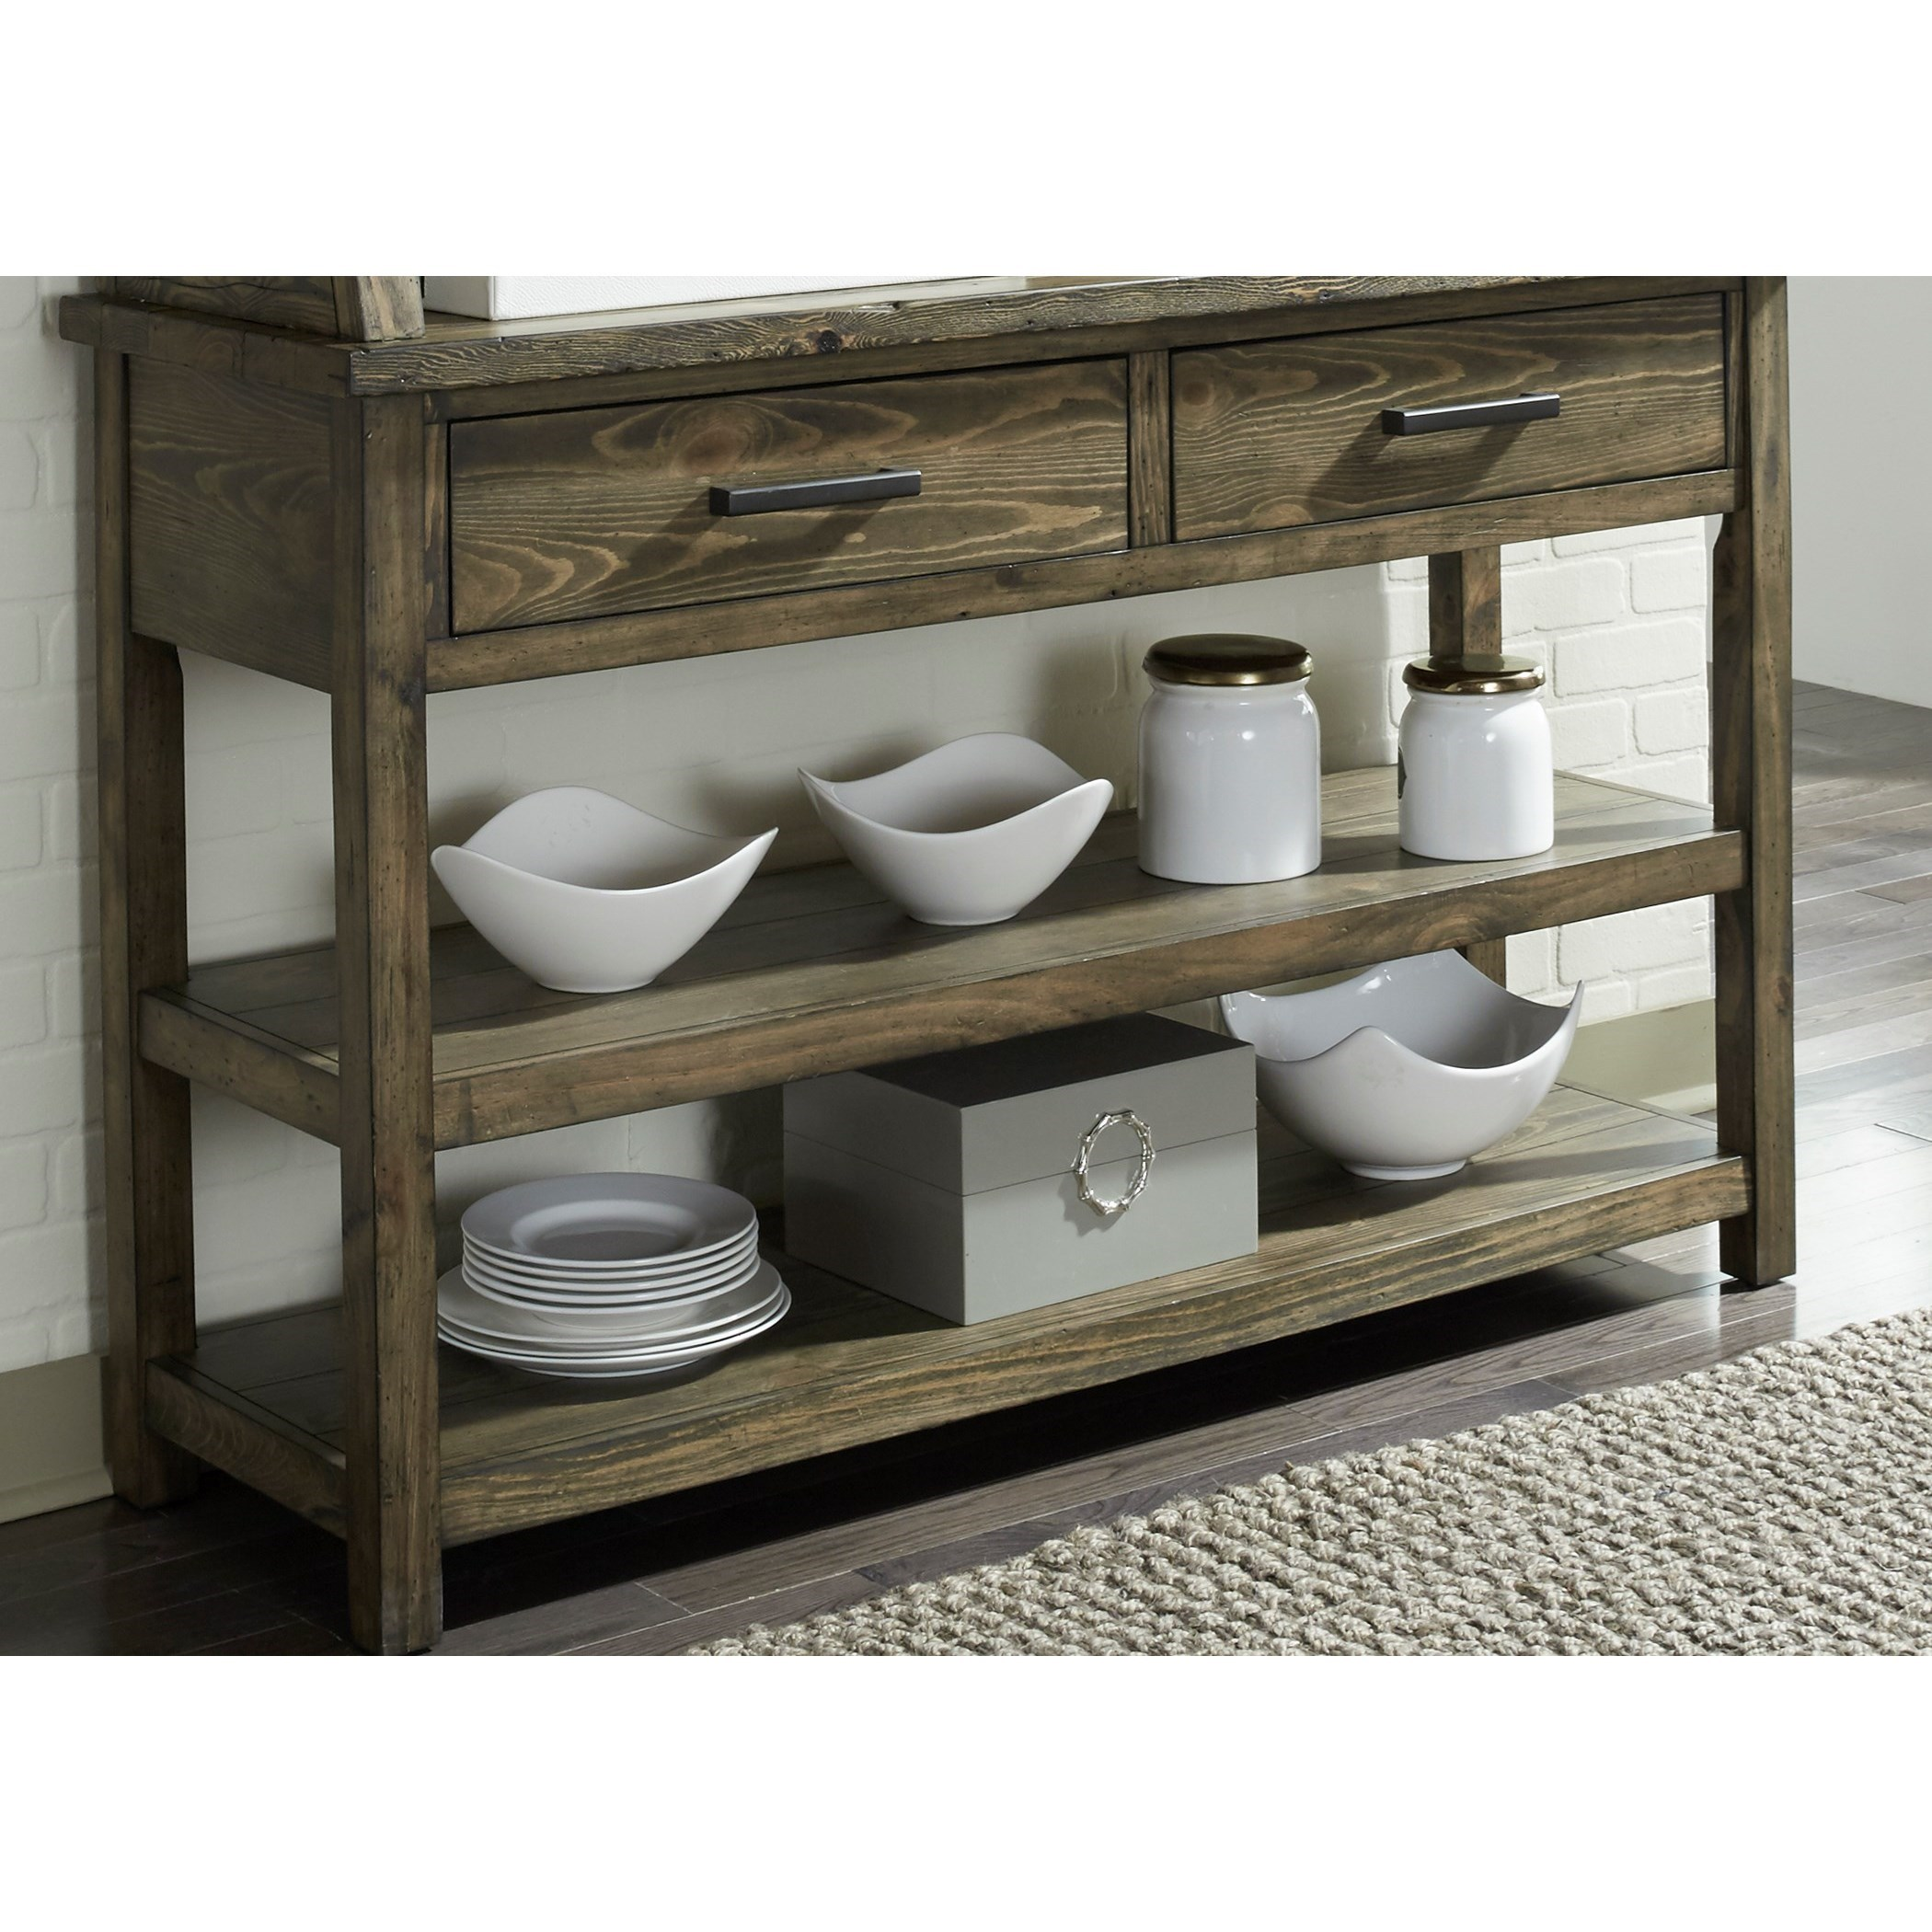 Superb Liberty Furniture Caldwell Dining Server   Item Number: 117 SR5636